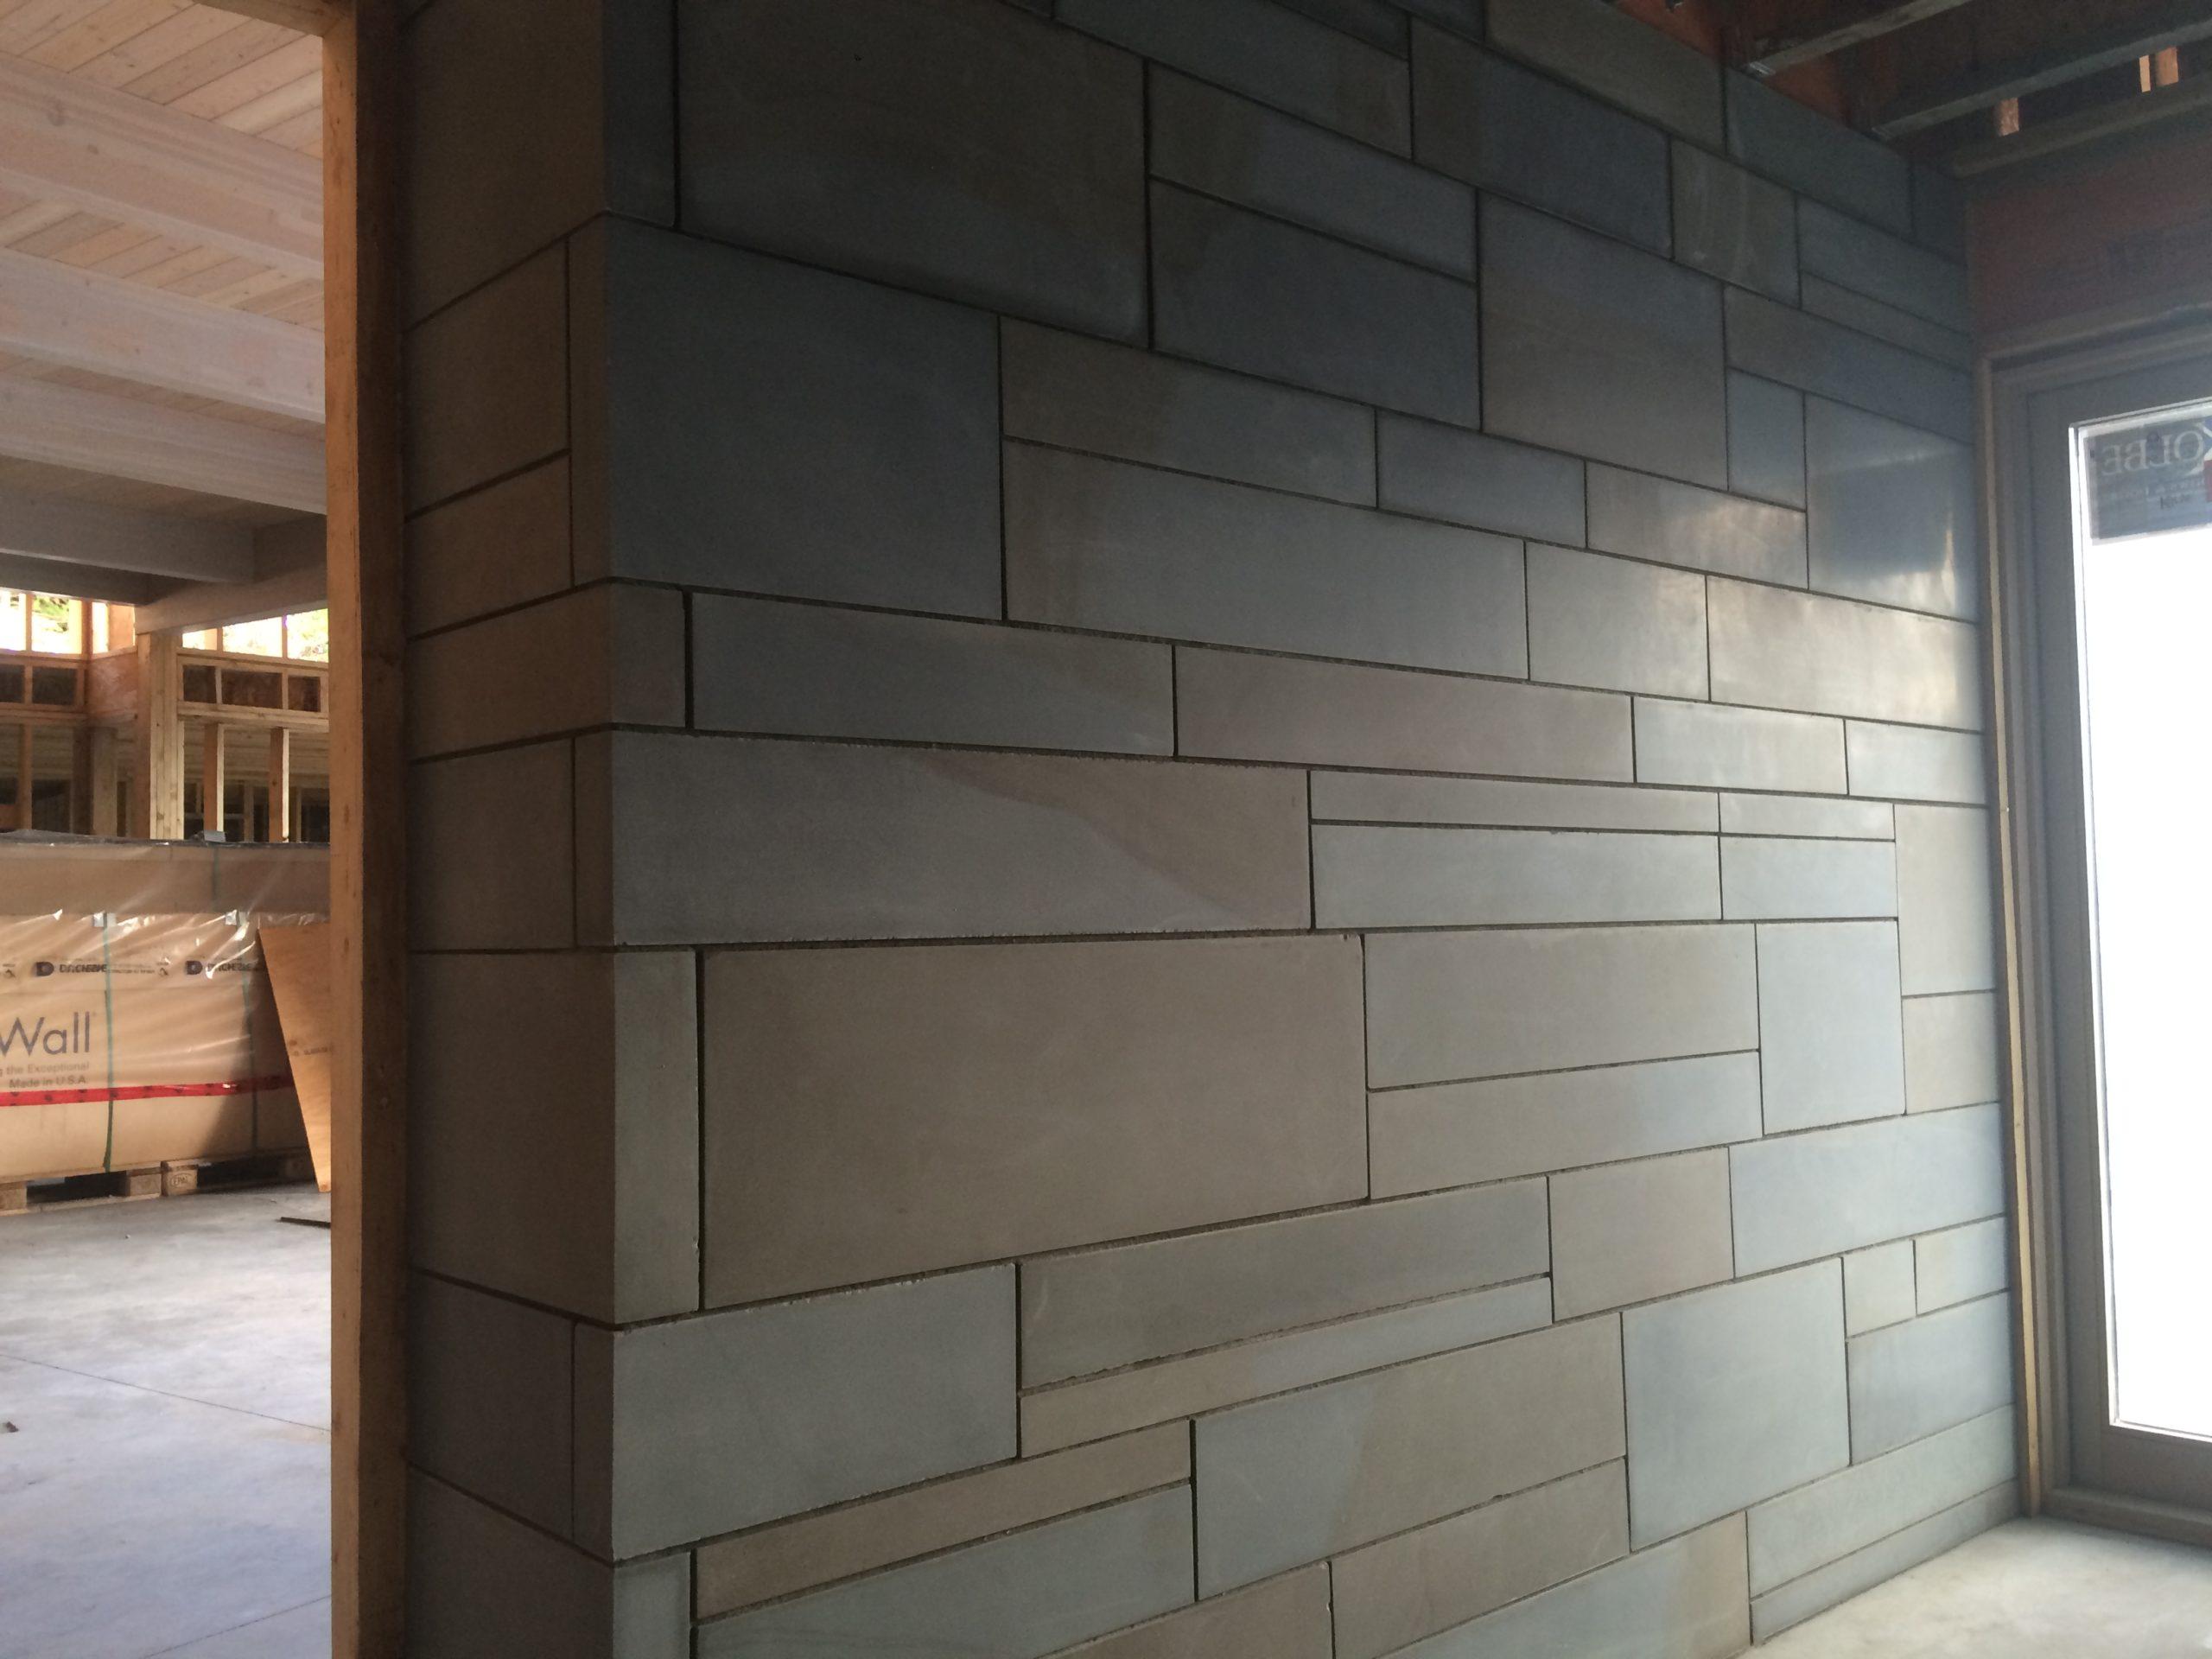 Sechelt Residence Interior Wall